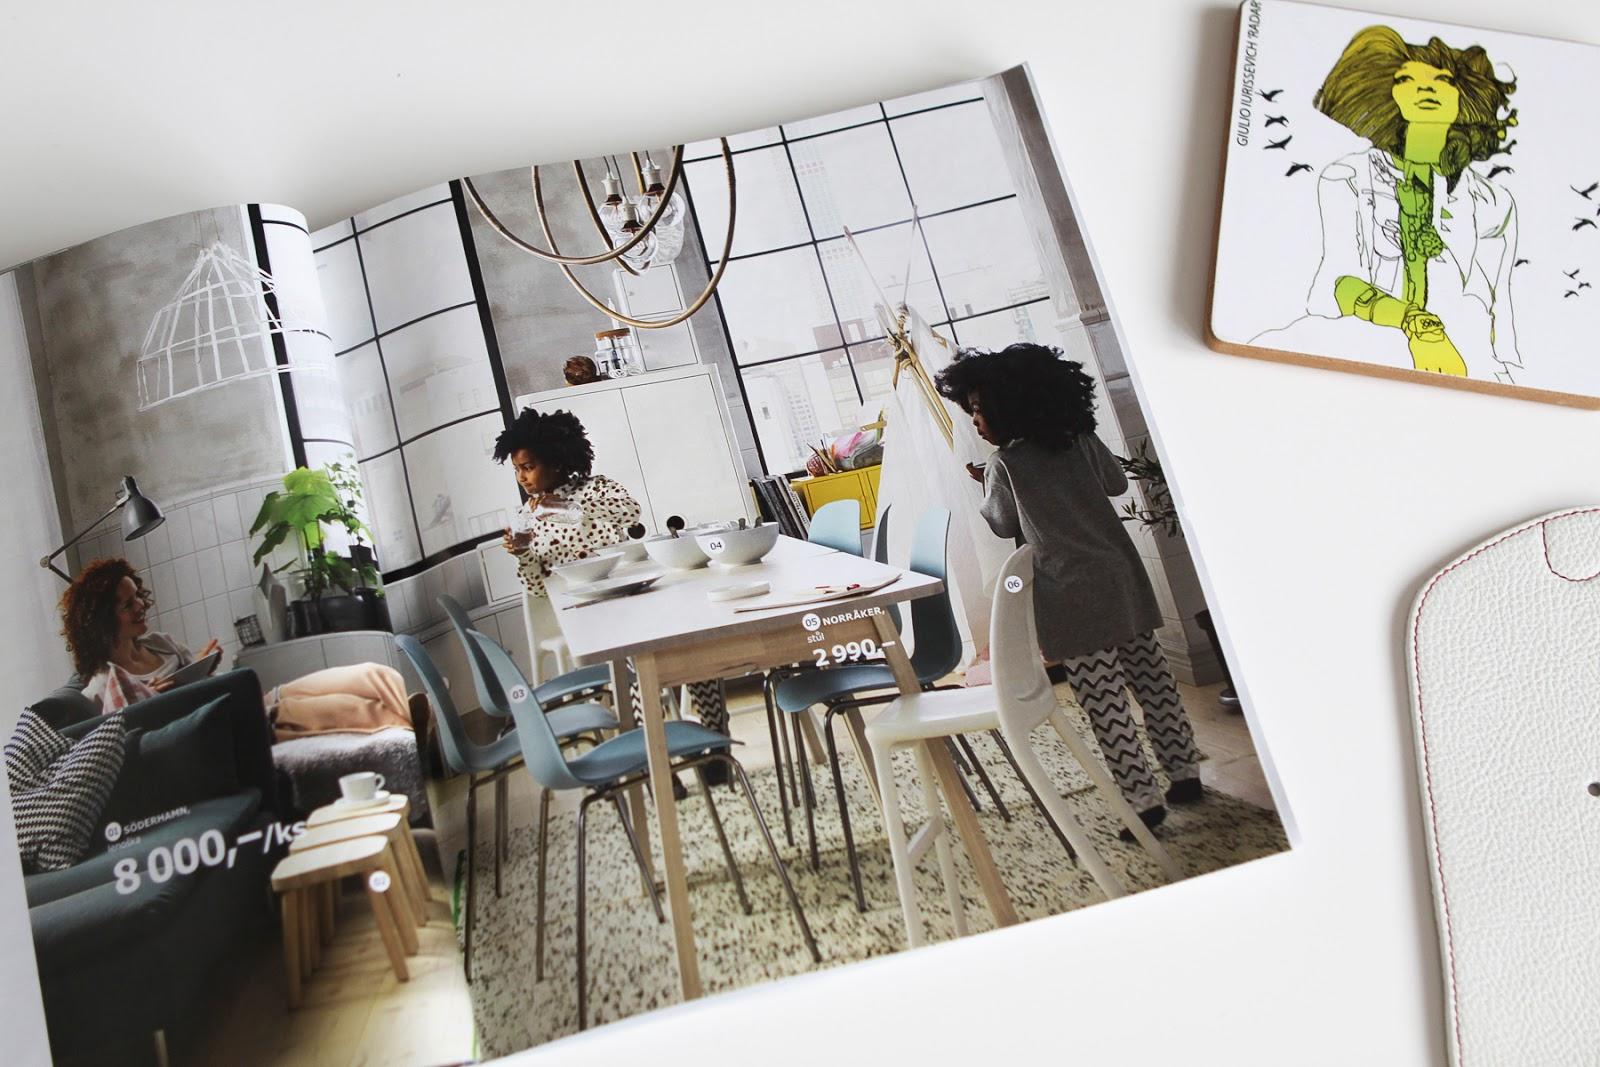 m j d m m j squat zaj mav l nky designov n pady ikea p edstavila katalog 2017. Black Bedroom Furniture Sets. Home Design Ideas